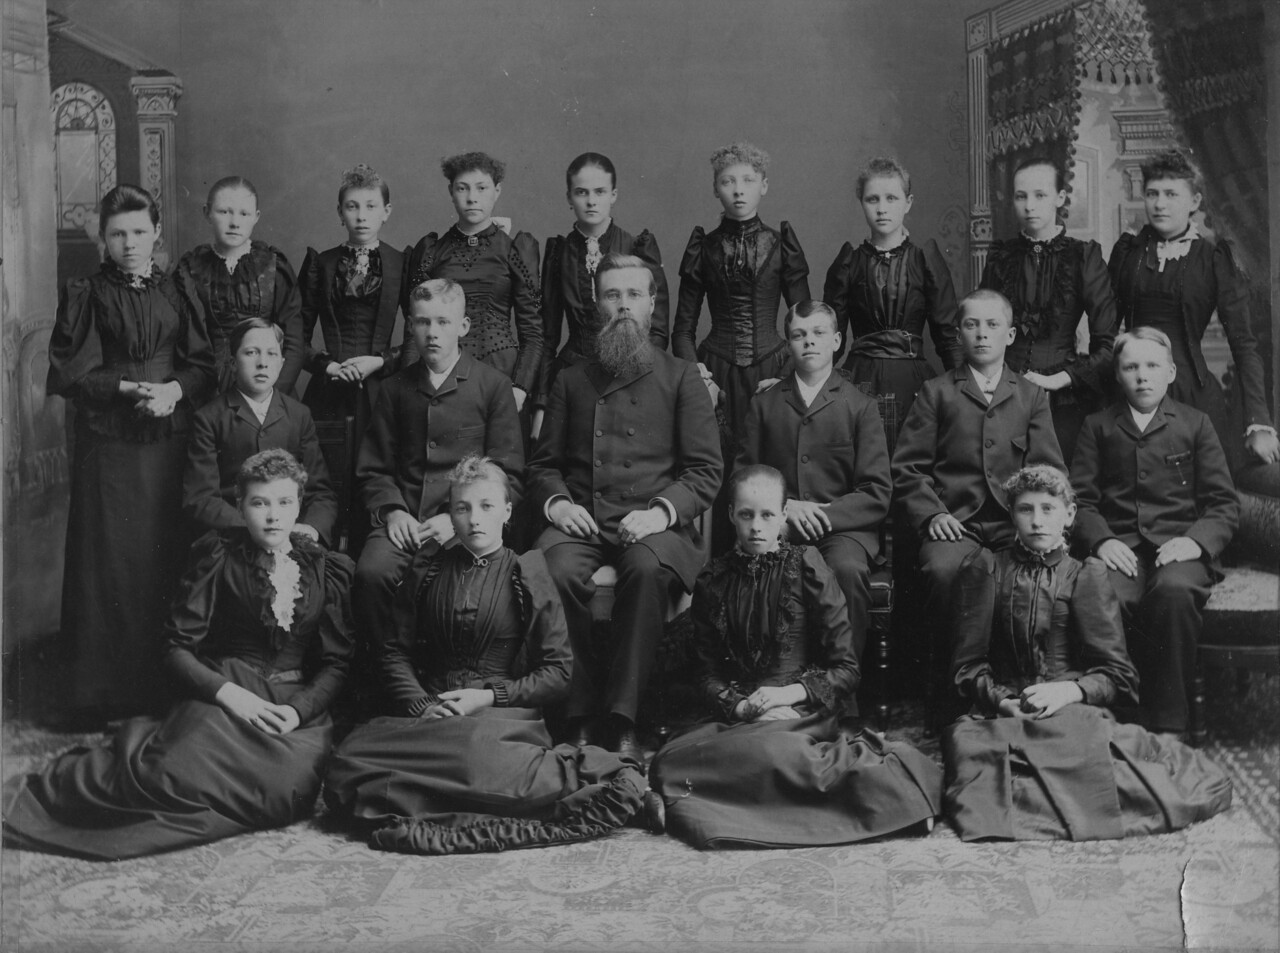 confirmation class - Jenny Johnson (Rear row, far left)